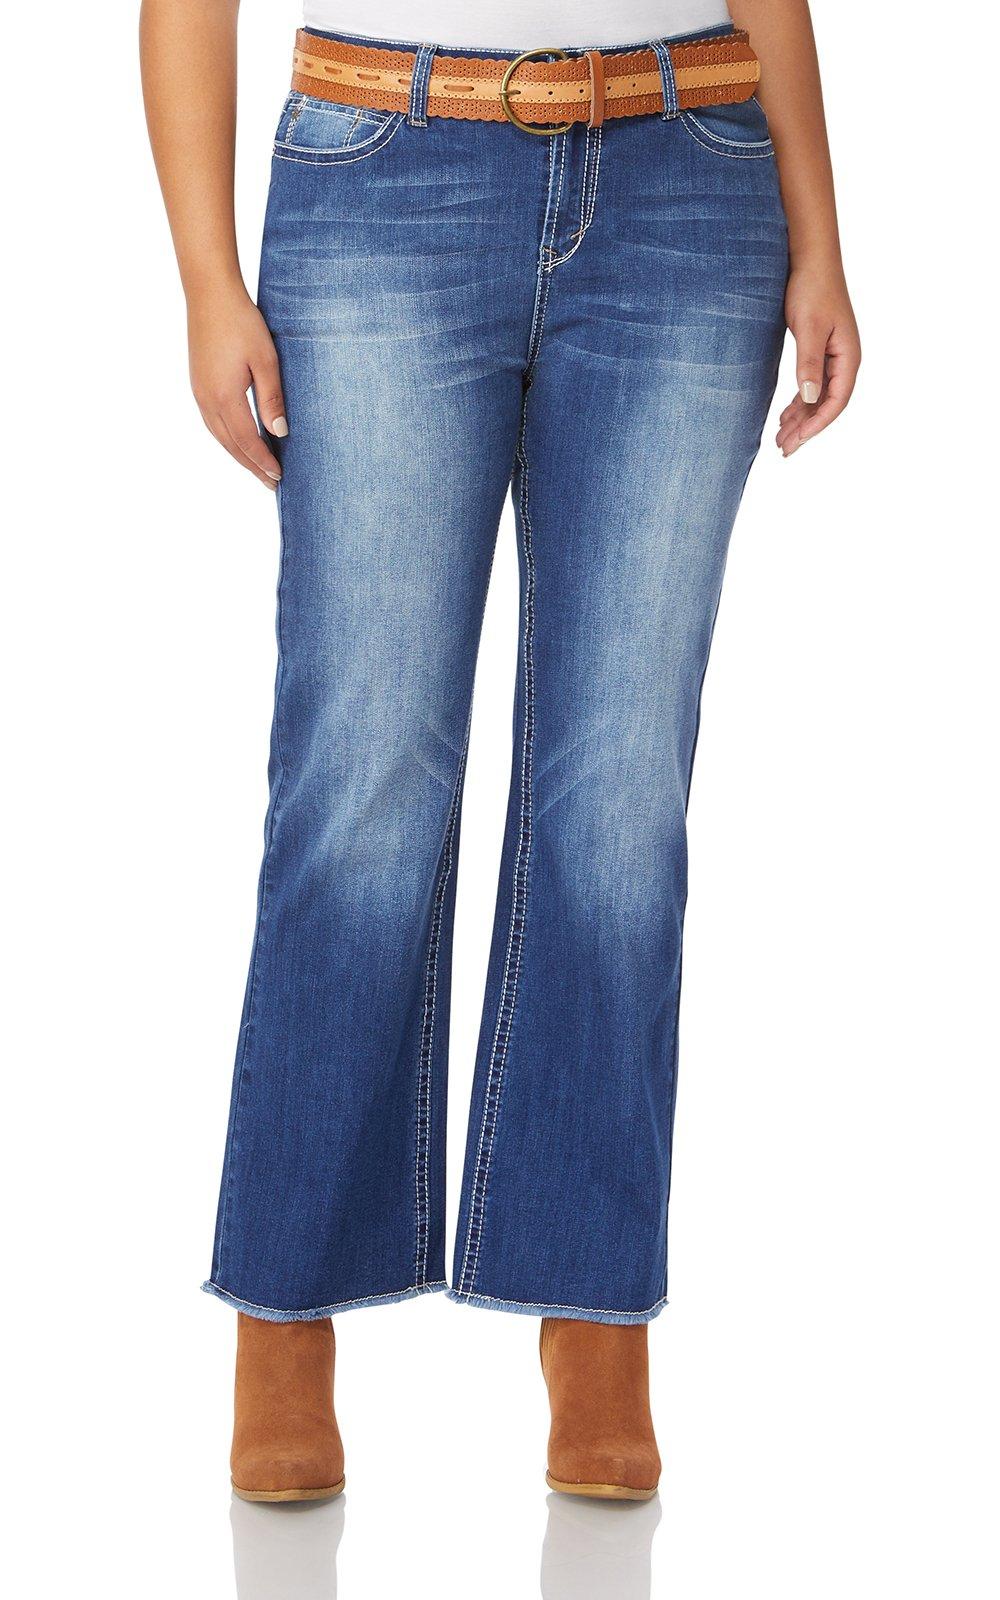 WallFlower Plus Size Belted Legendary Bootcut Jeans in Michelle, 20 Plus